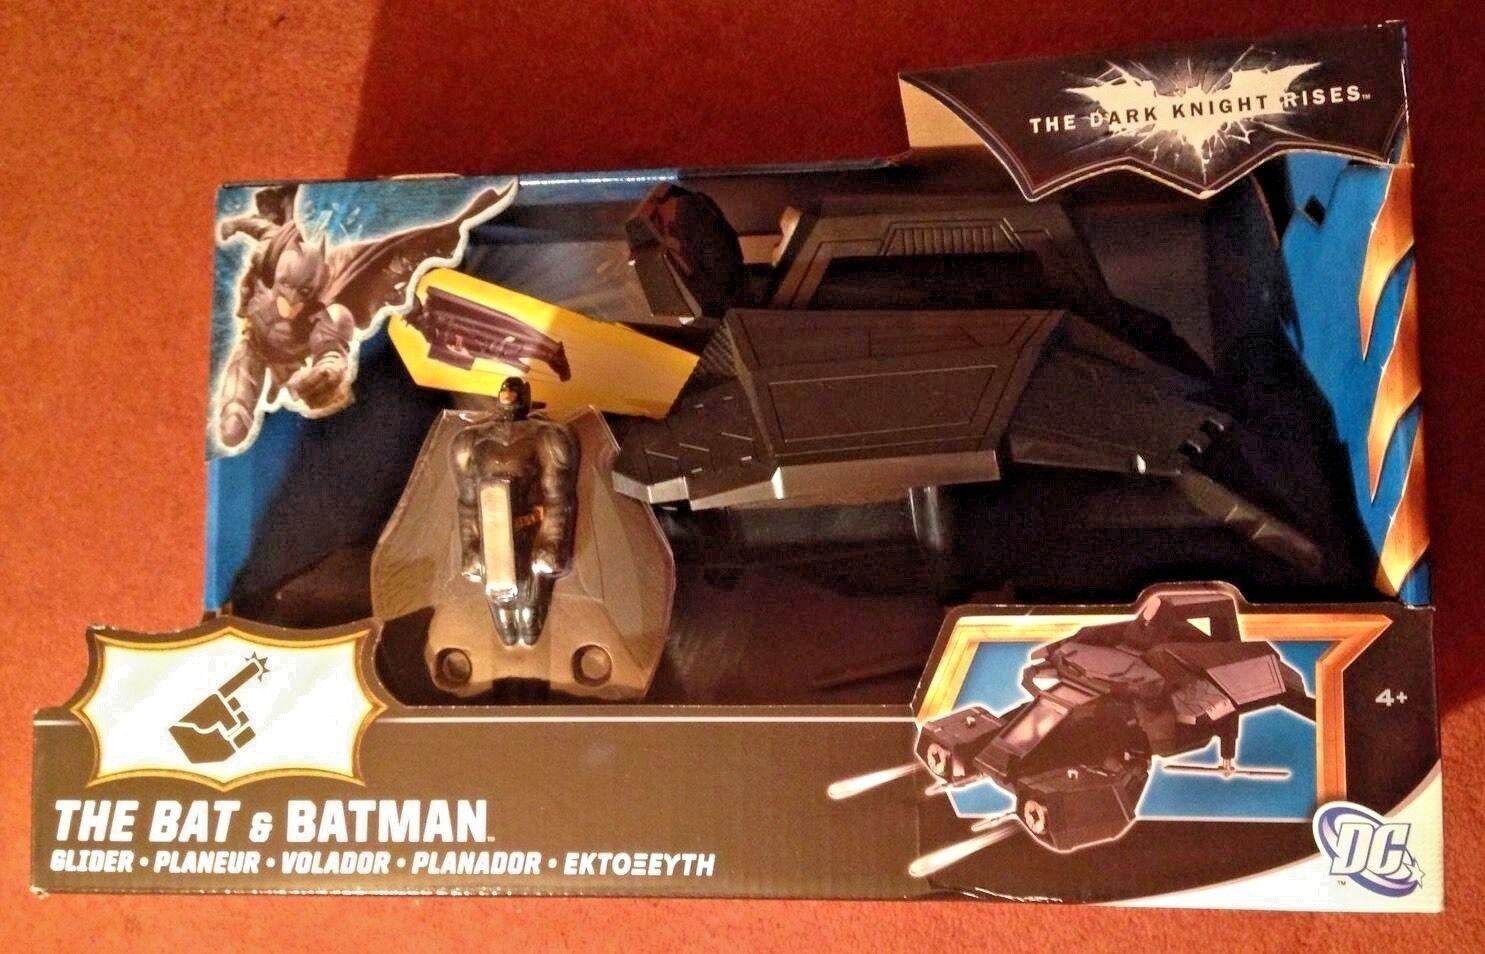 The Dark Knight Rises Bat And Batman Glider Glider Glider Original DC Comics Toy Brand New c2b21c